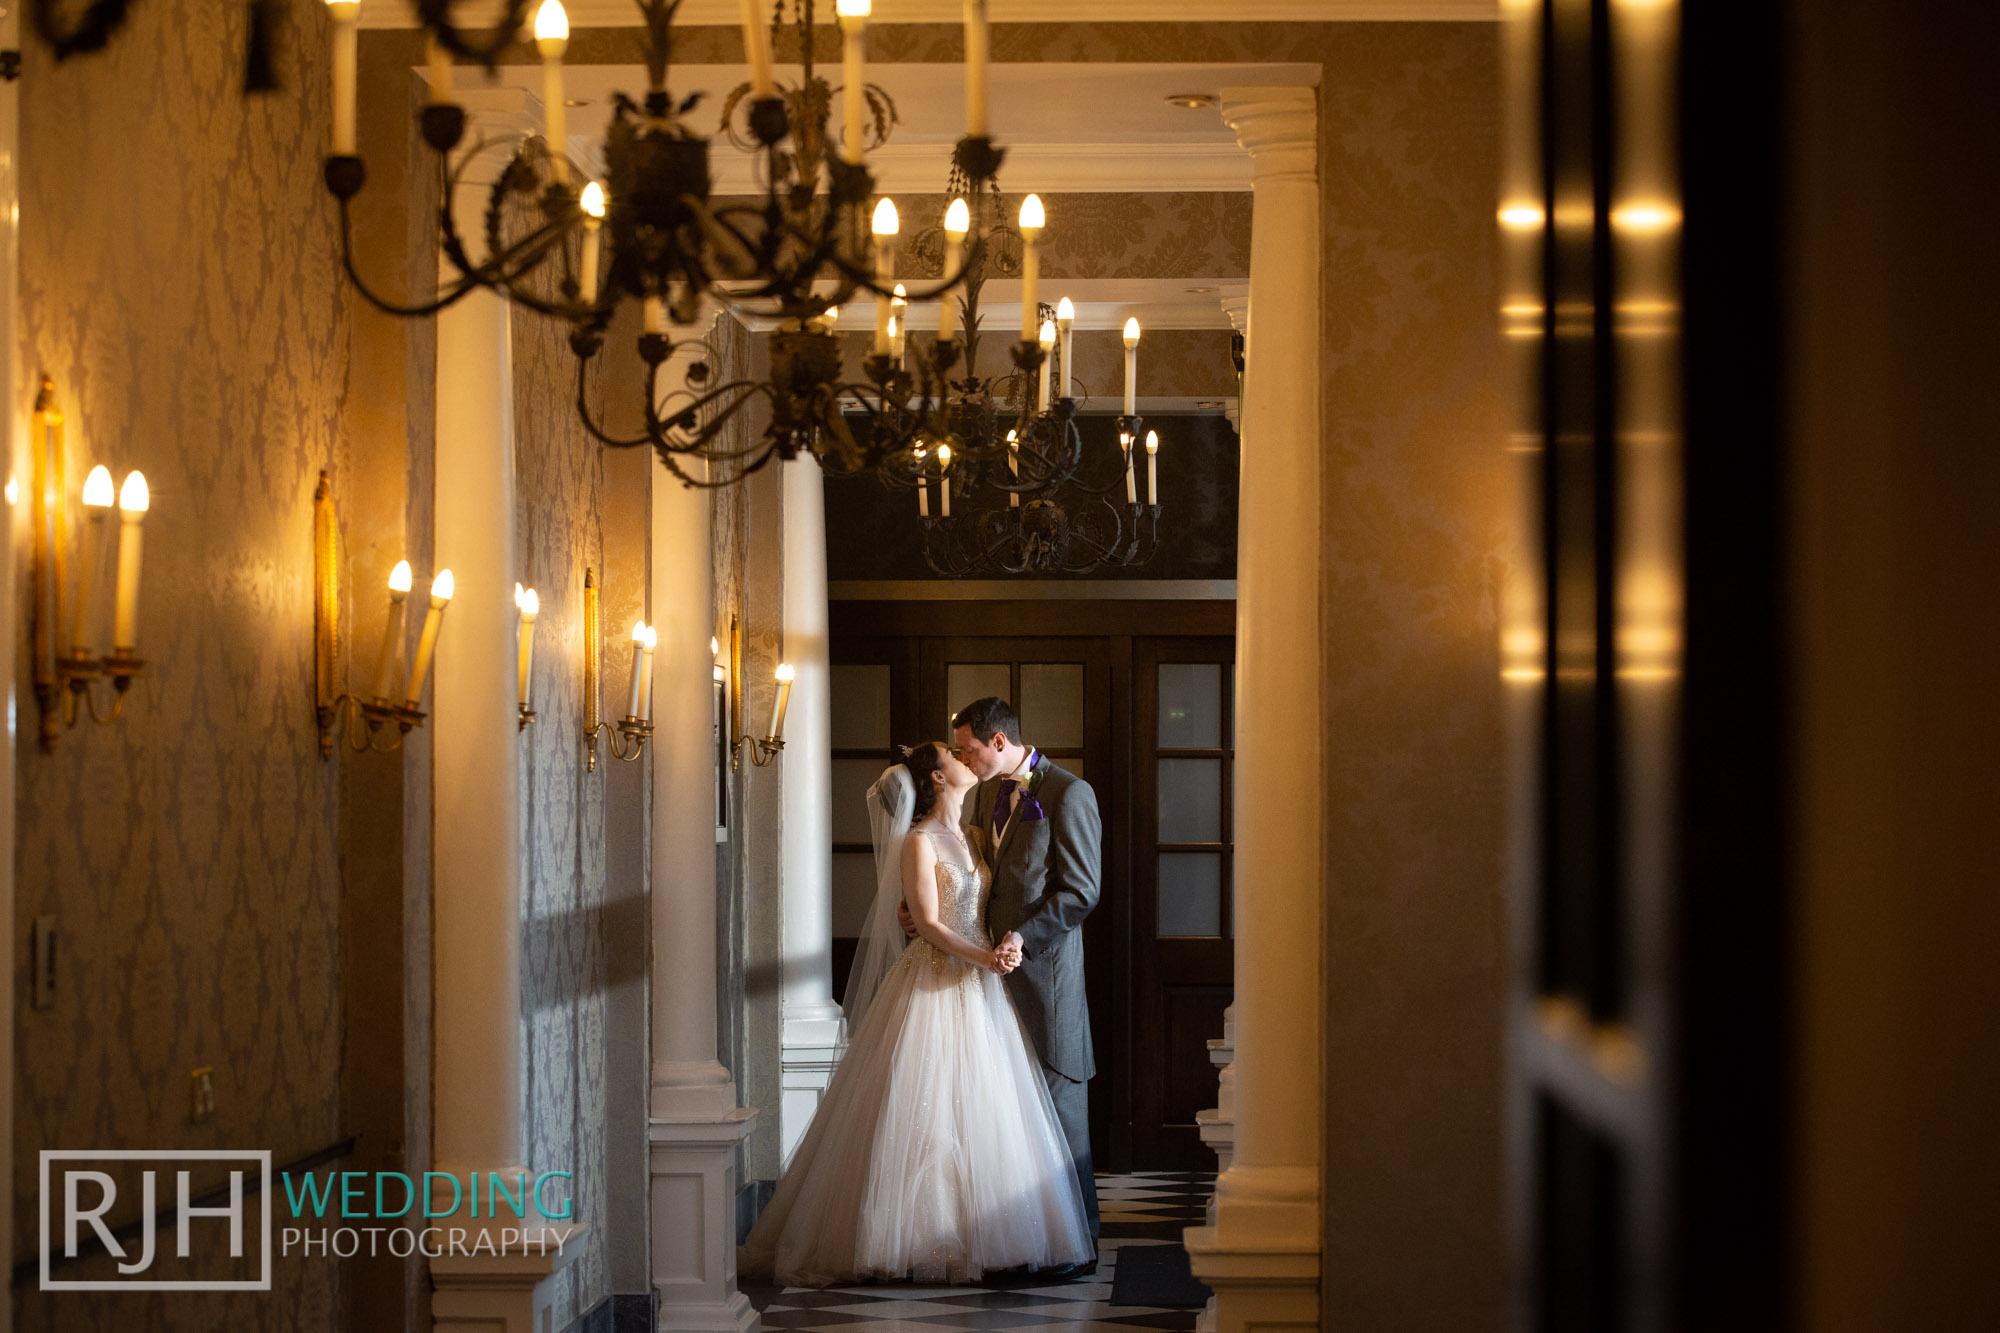 Oulton Hall Wedding Photography_Goodwill-Hall_049_RJH18266.jpg